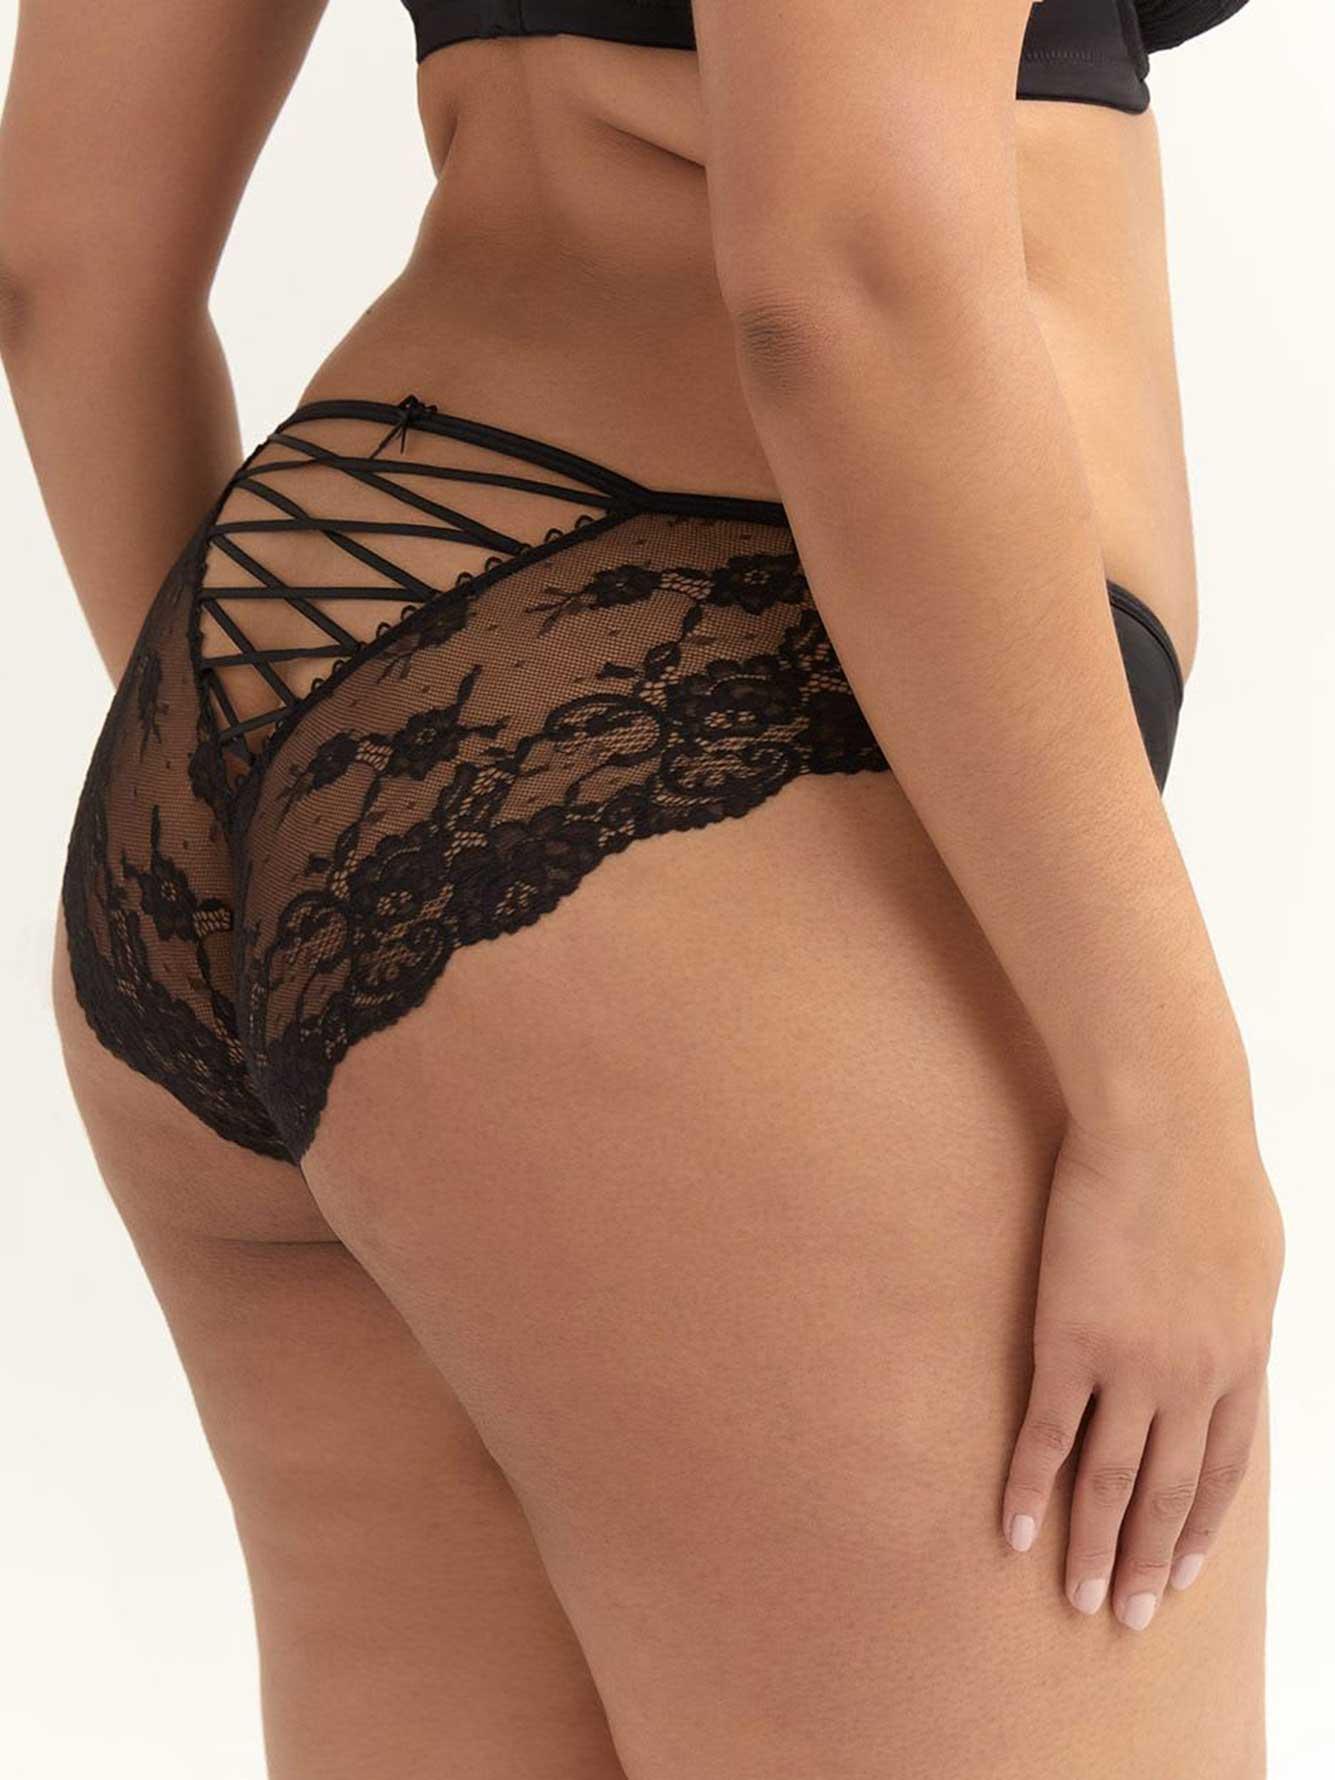 b048929f81c42 Low Rise Bikini Panty with Back Lace-Up - Ashley Graham